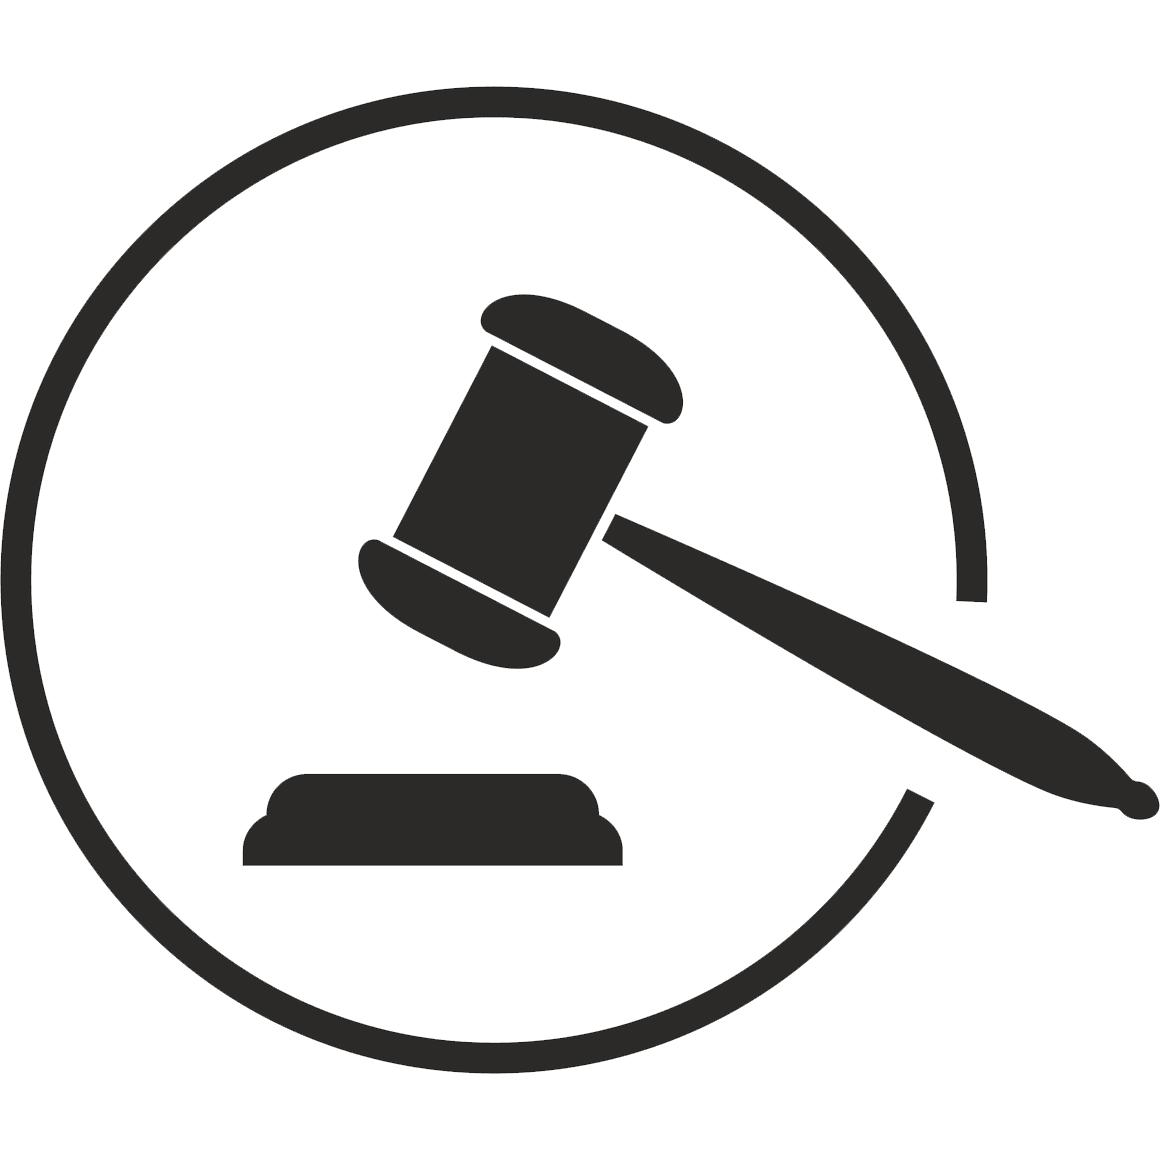 Polonsky & Polonsky Attorneys At Law